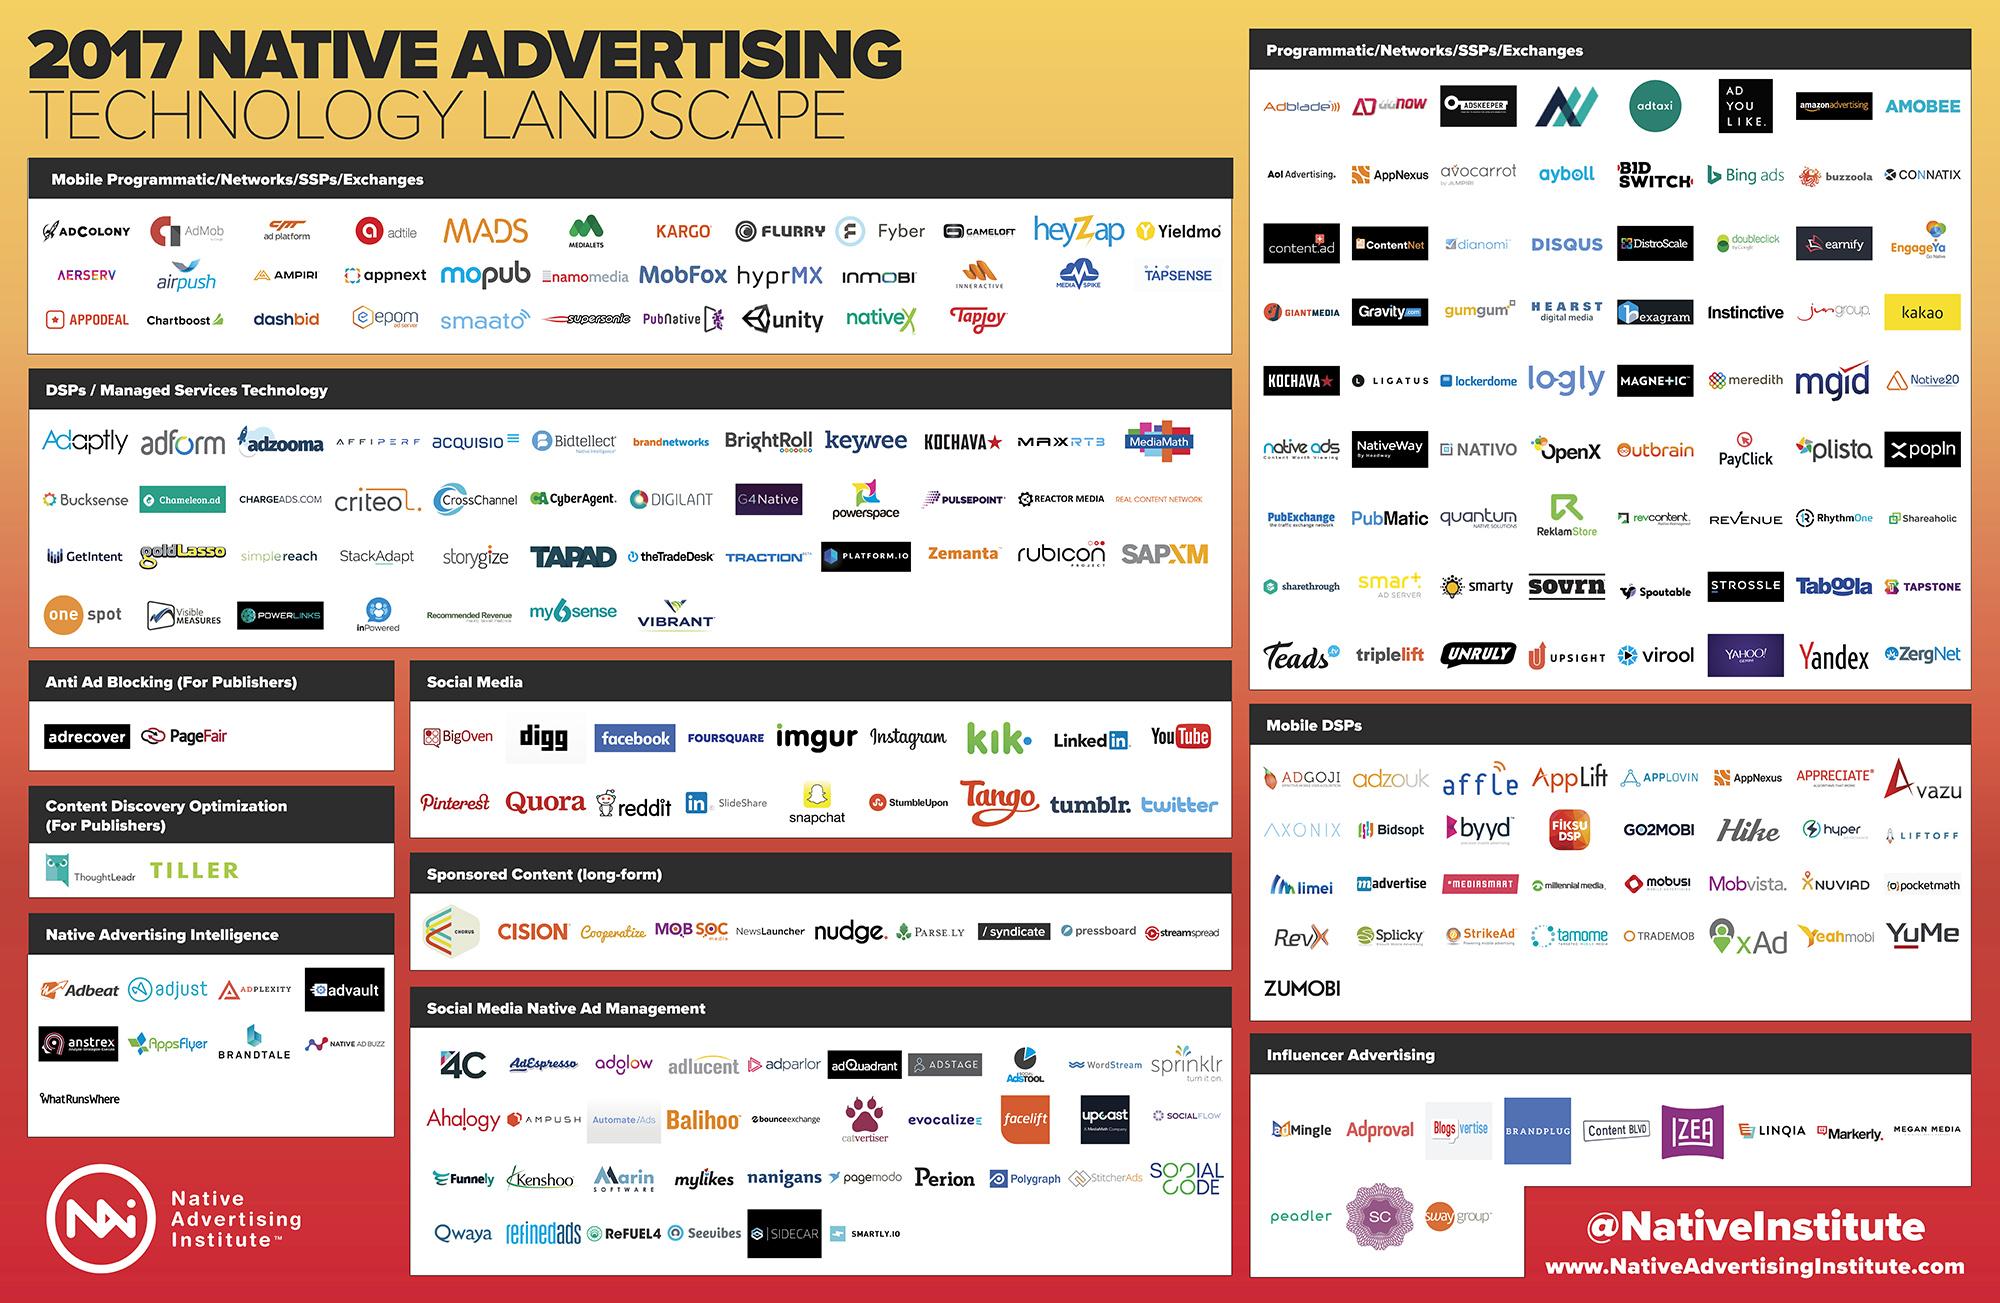 The 2017 Social Media Native Advertising Landscape | Social Media Today